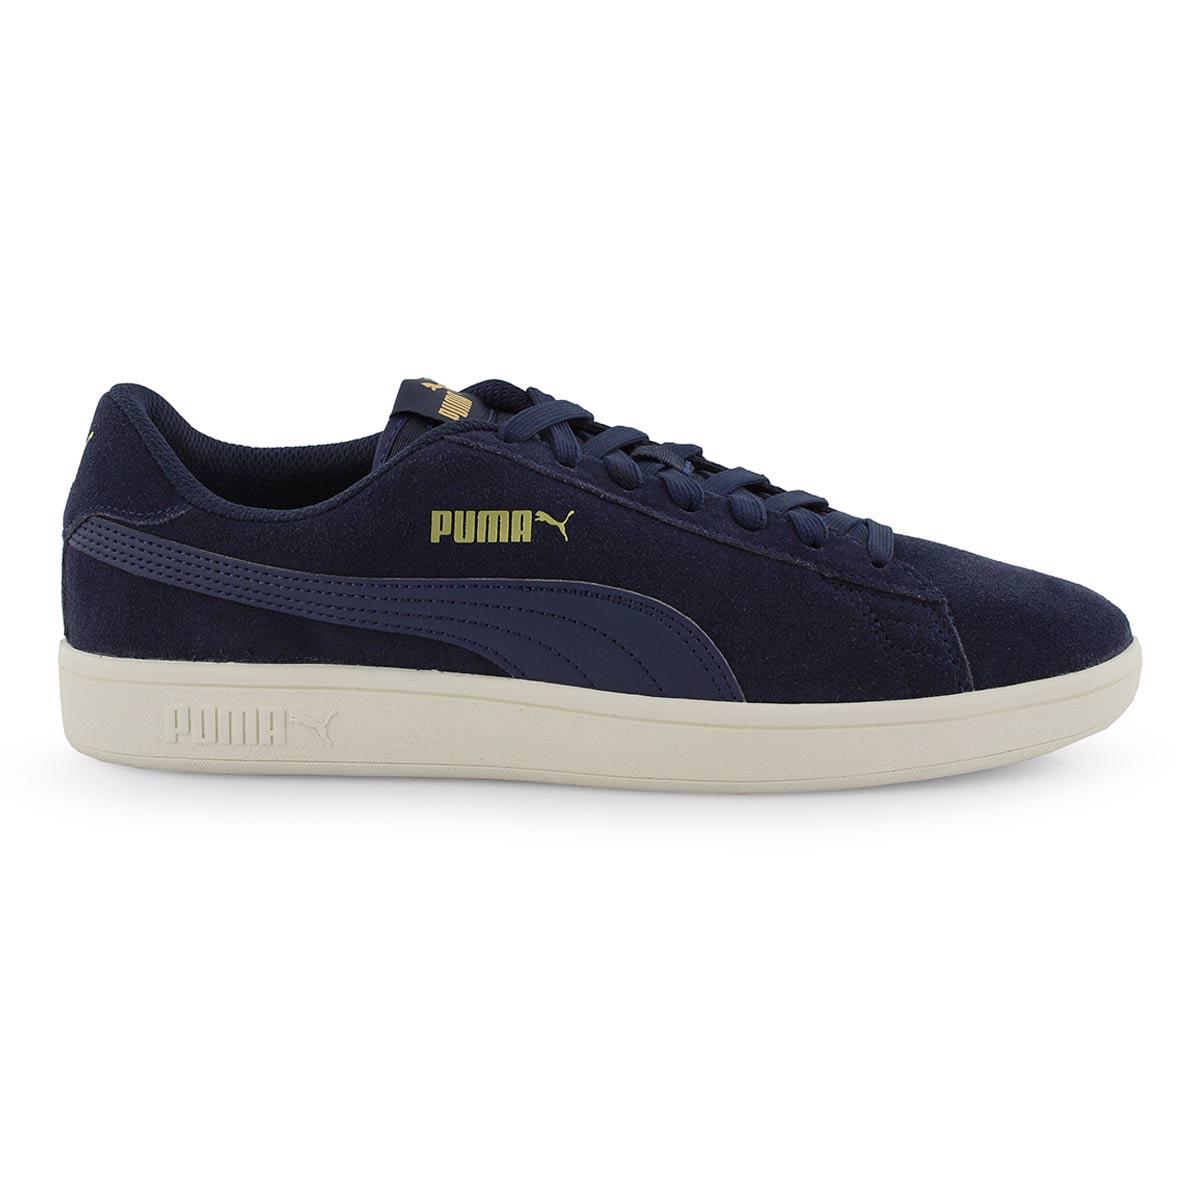 Mns Puma Smash v2 peacoat/gld sneaker